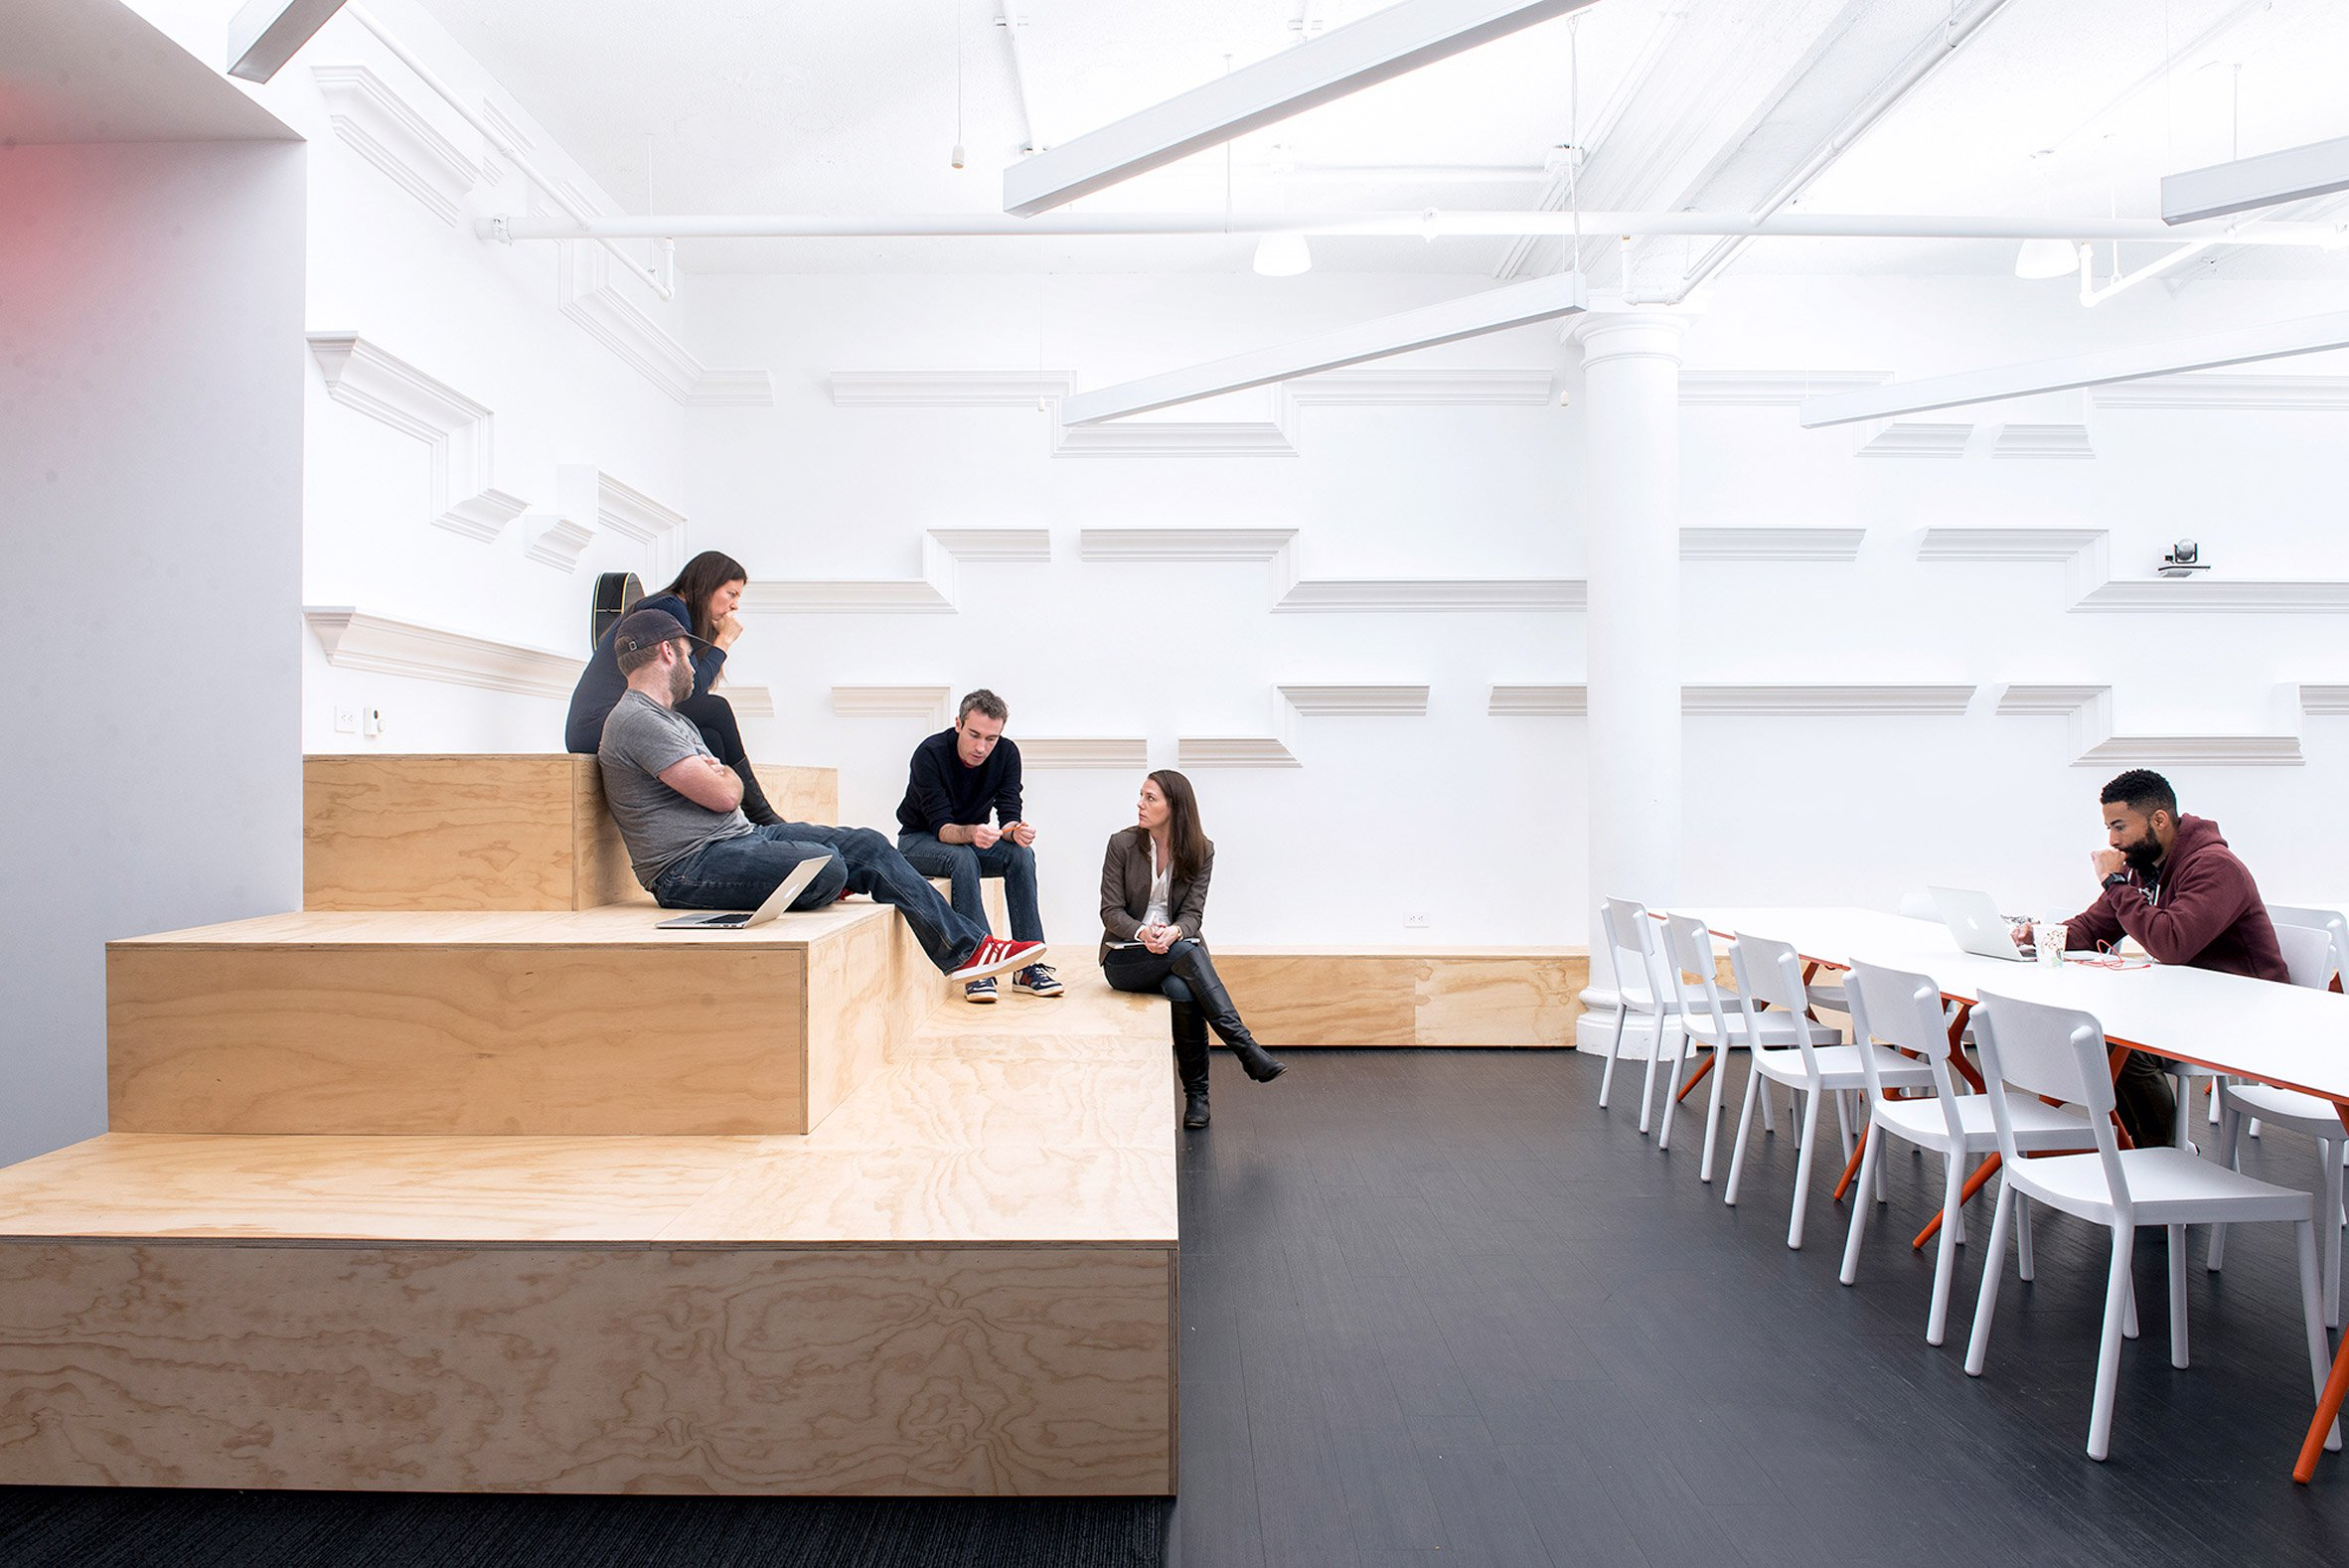 architecture-interiors-offices- manhatten-new-york-design-studia-osnovadesign-osnova-poltava_07